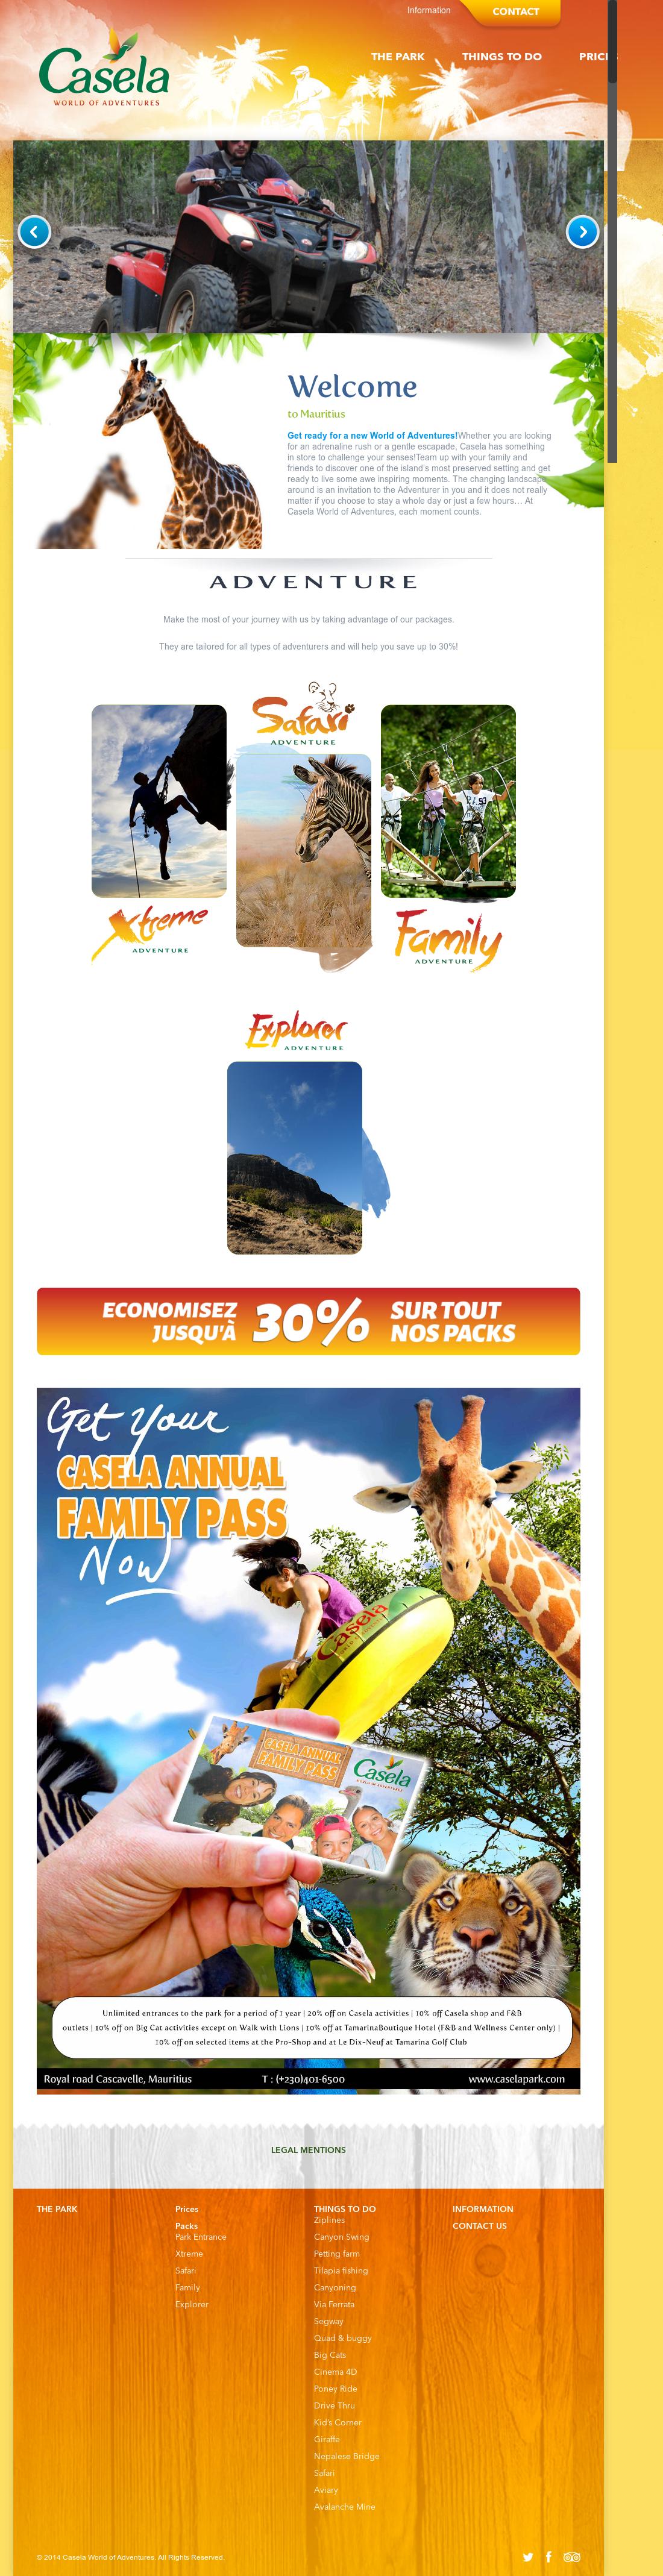 casela promotion 2016